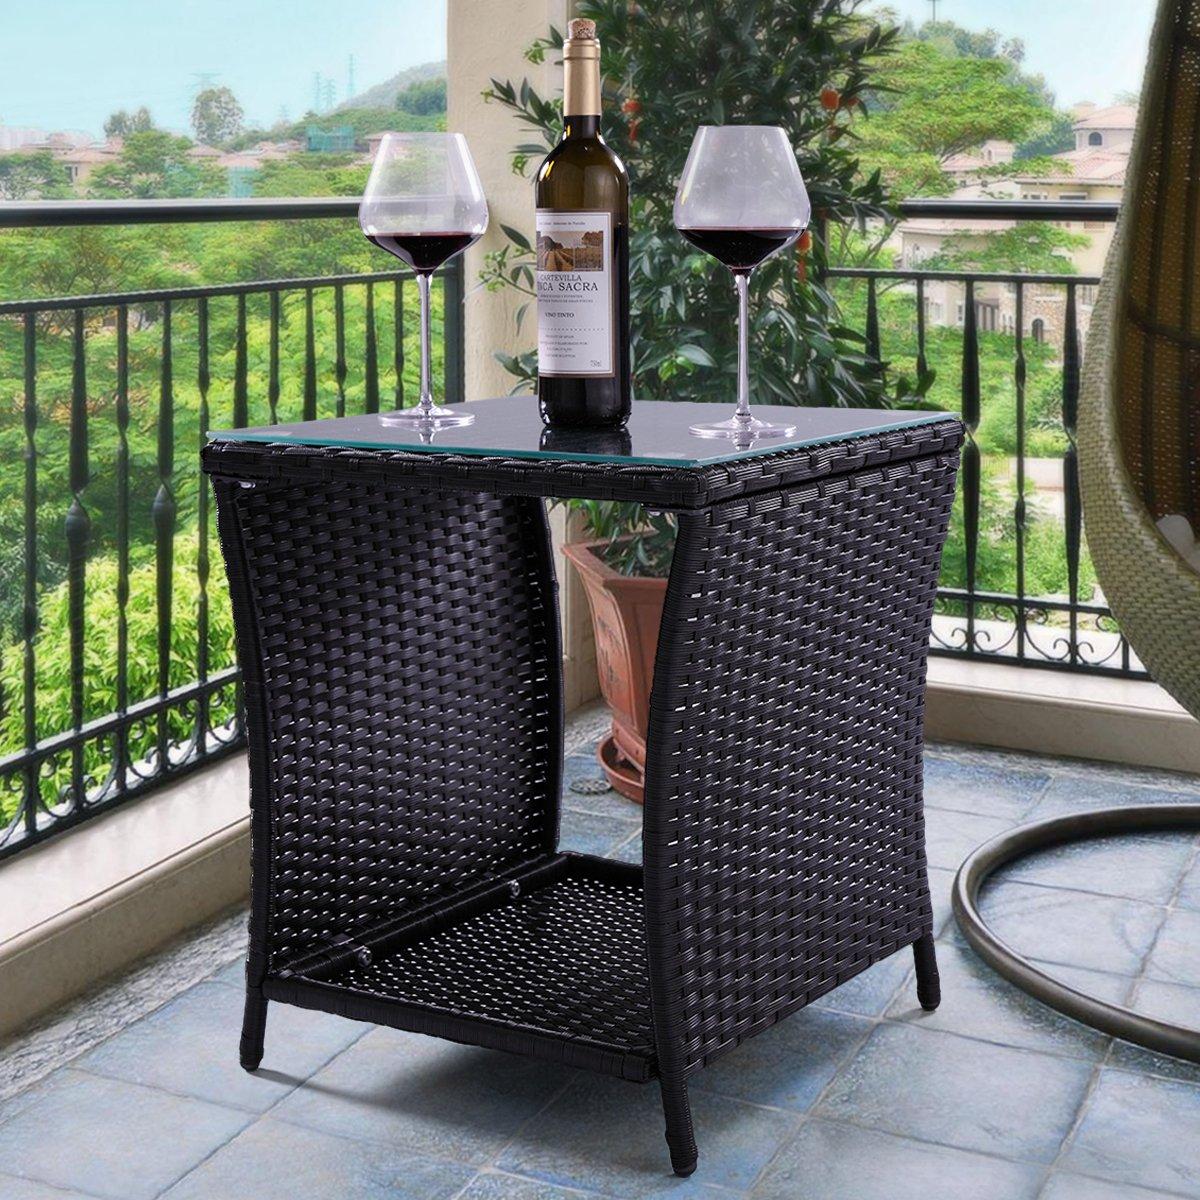 LAZYMOON Outdoor Wicker Rattan Side Table Patio Garden Yard Coffee Table Glass Top